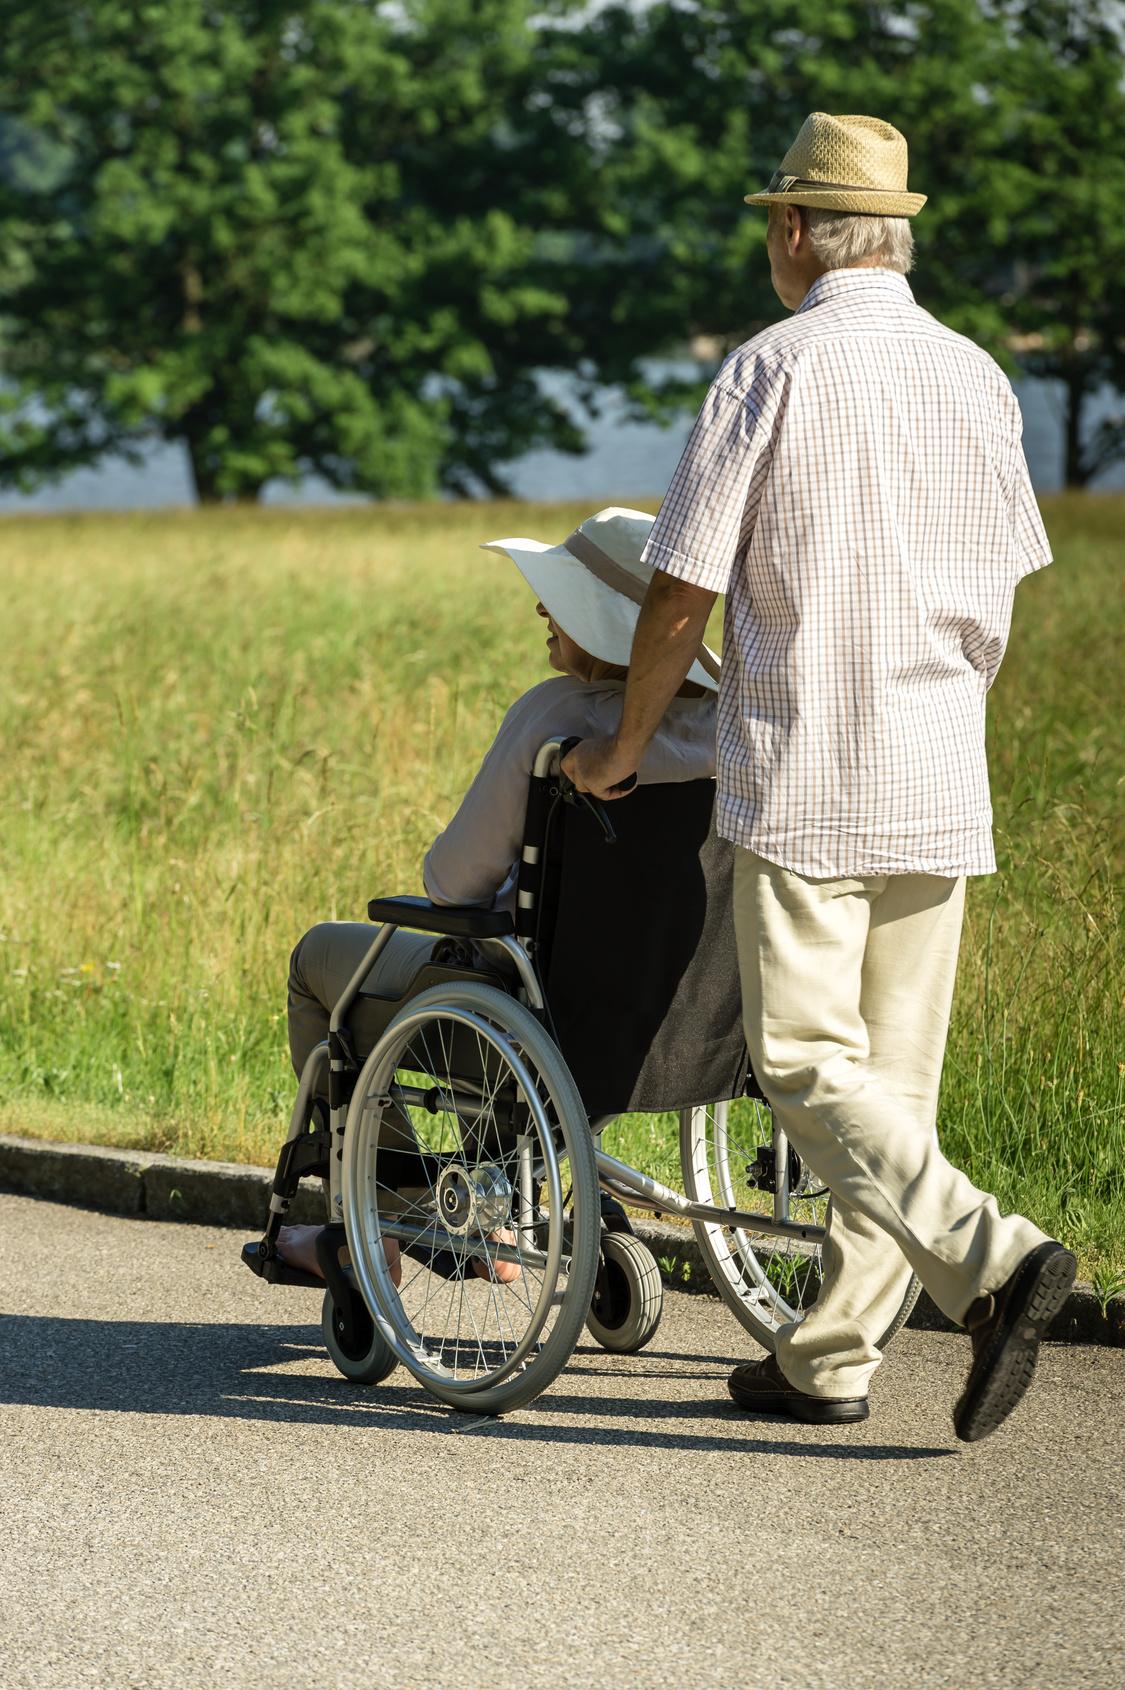 Senior husband pushing wife's wheelchair in park